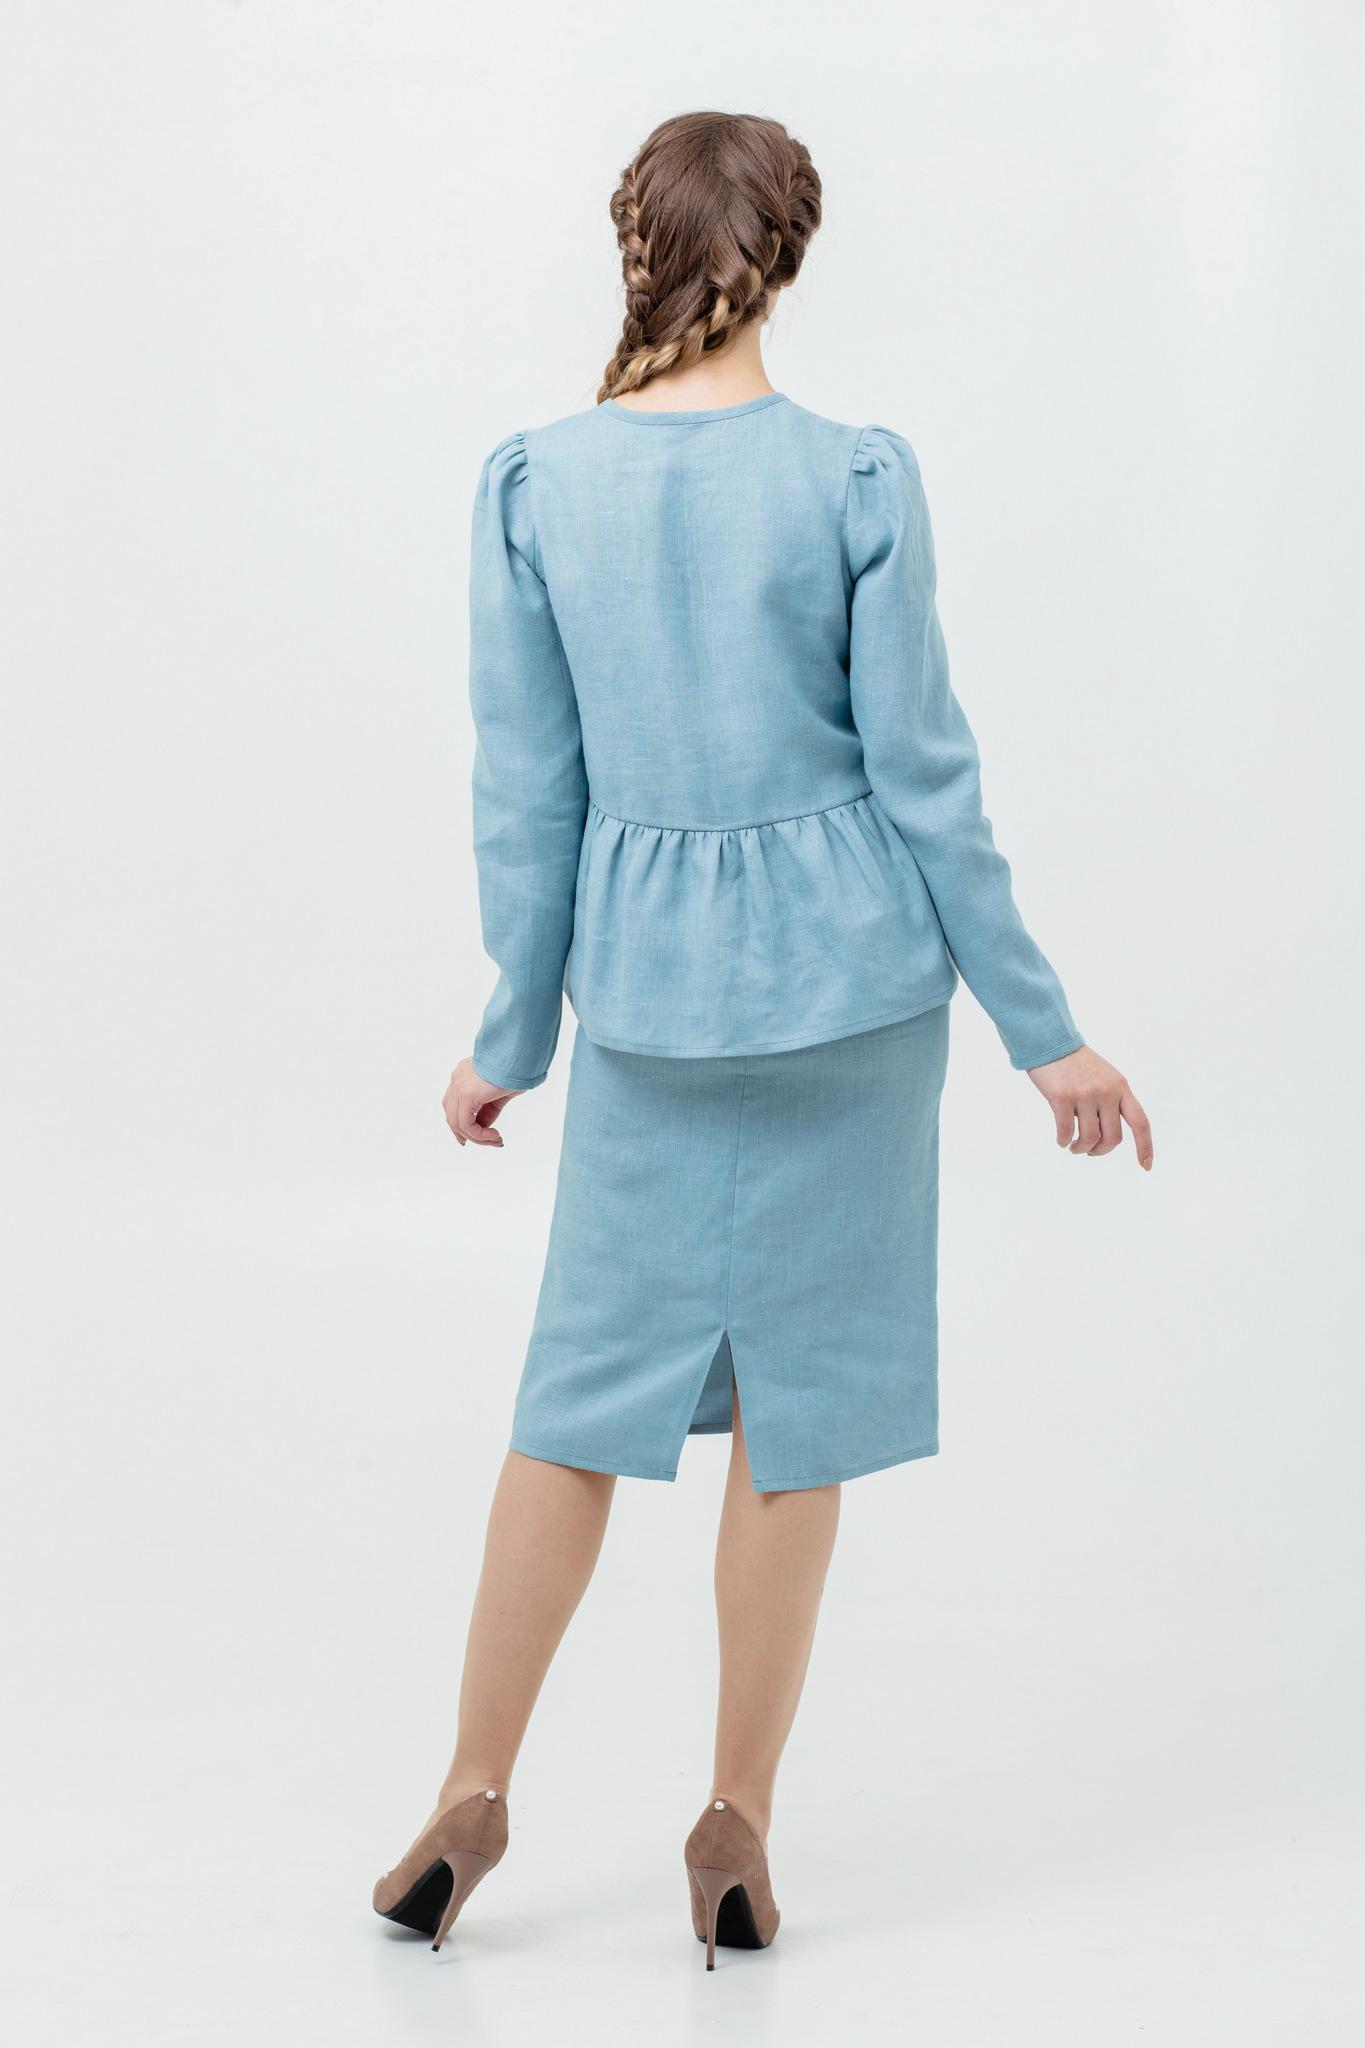 Блуза с оборкой из льна Ледяная мята